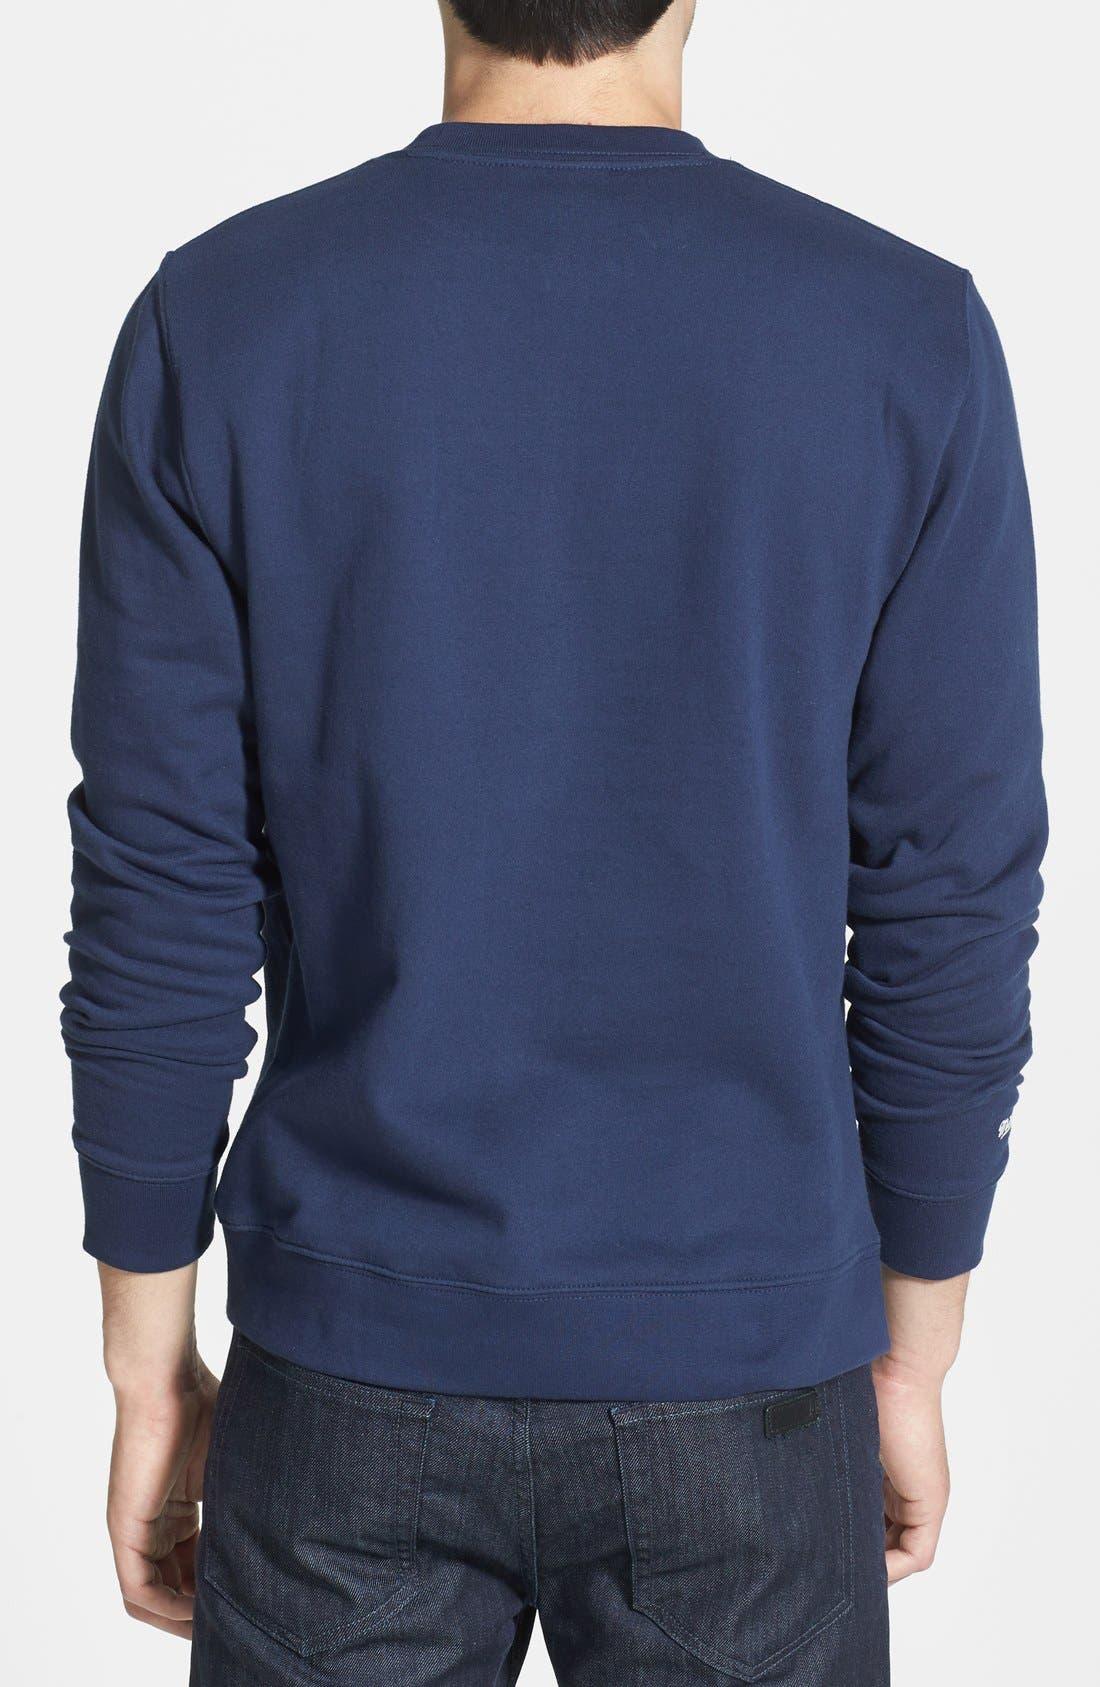 Alternate Image 2  - Mitchell & Ness 'St. Louis Cardinals' Crewneck Sweatshirt